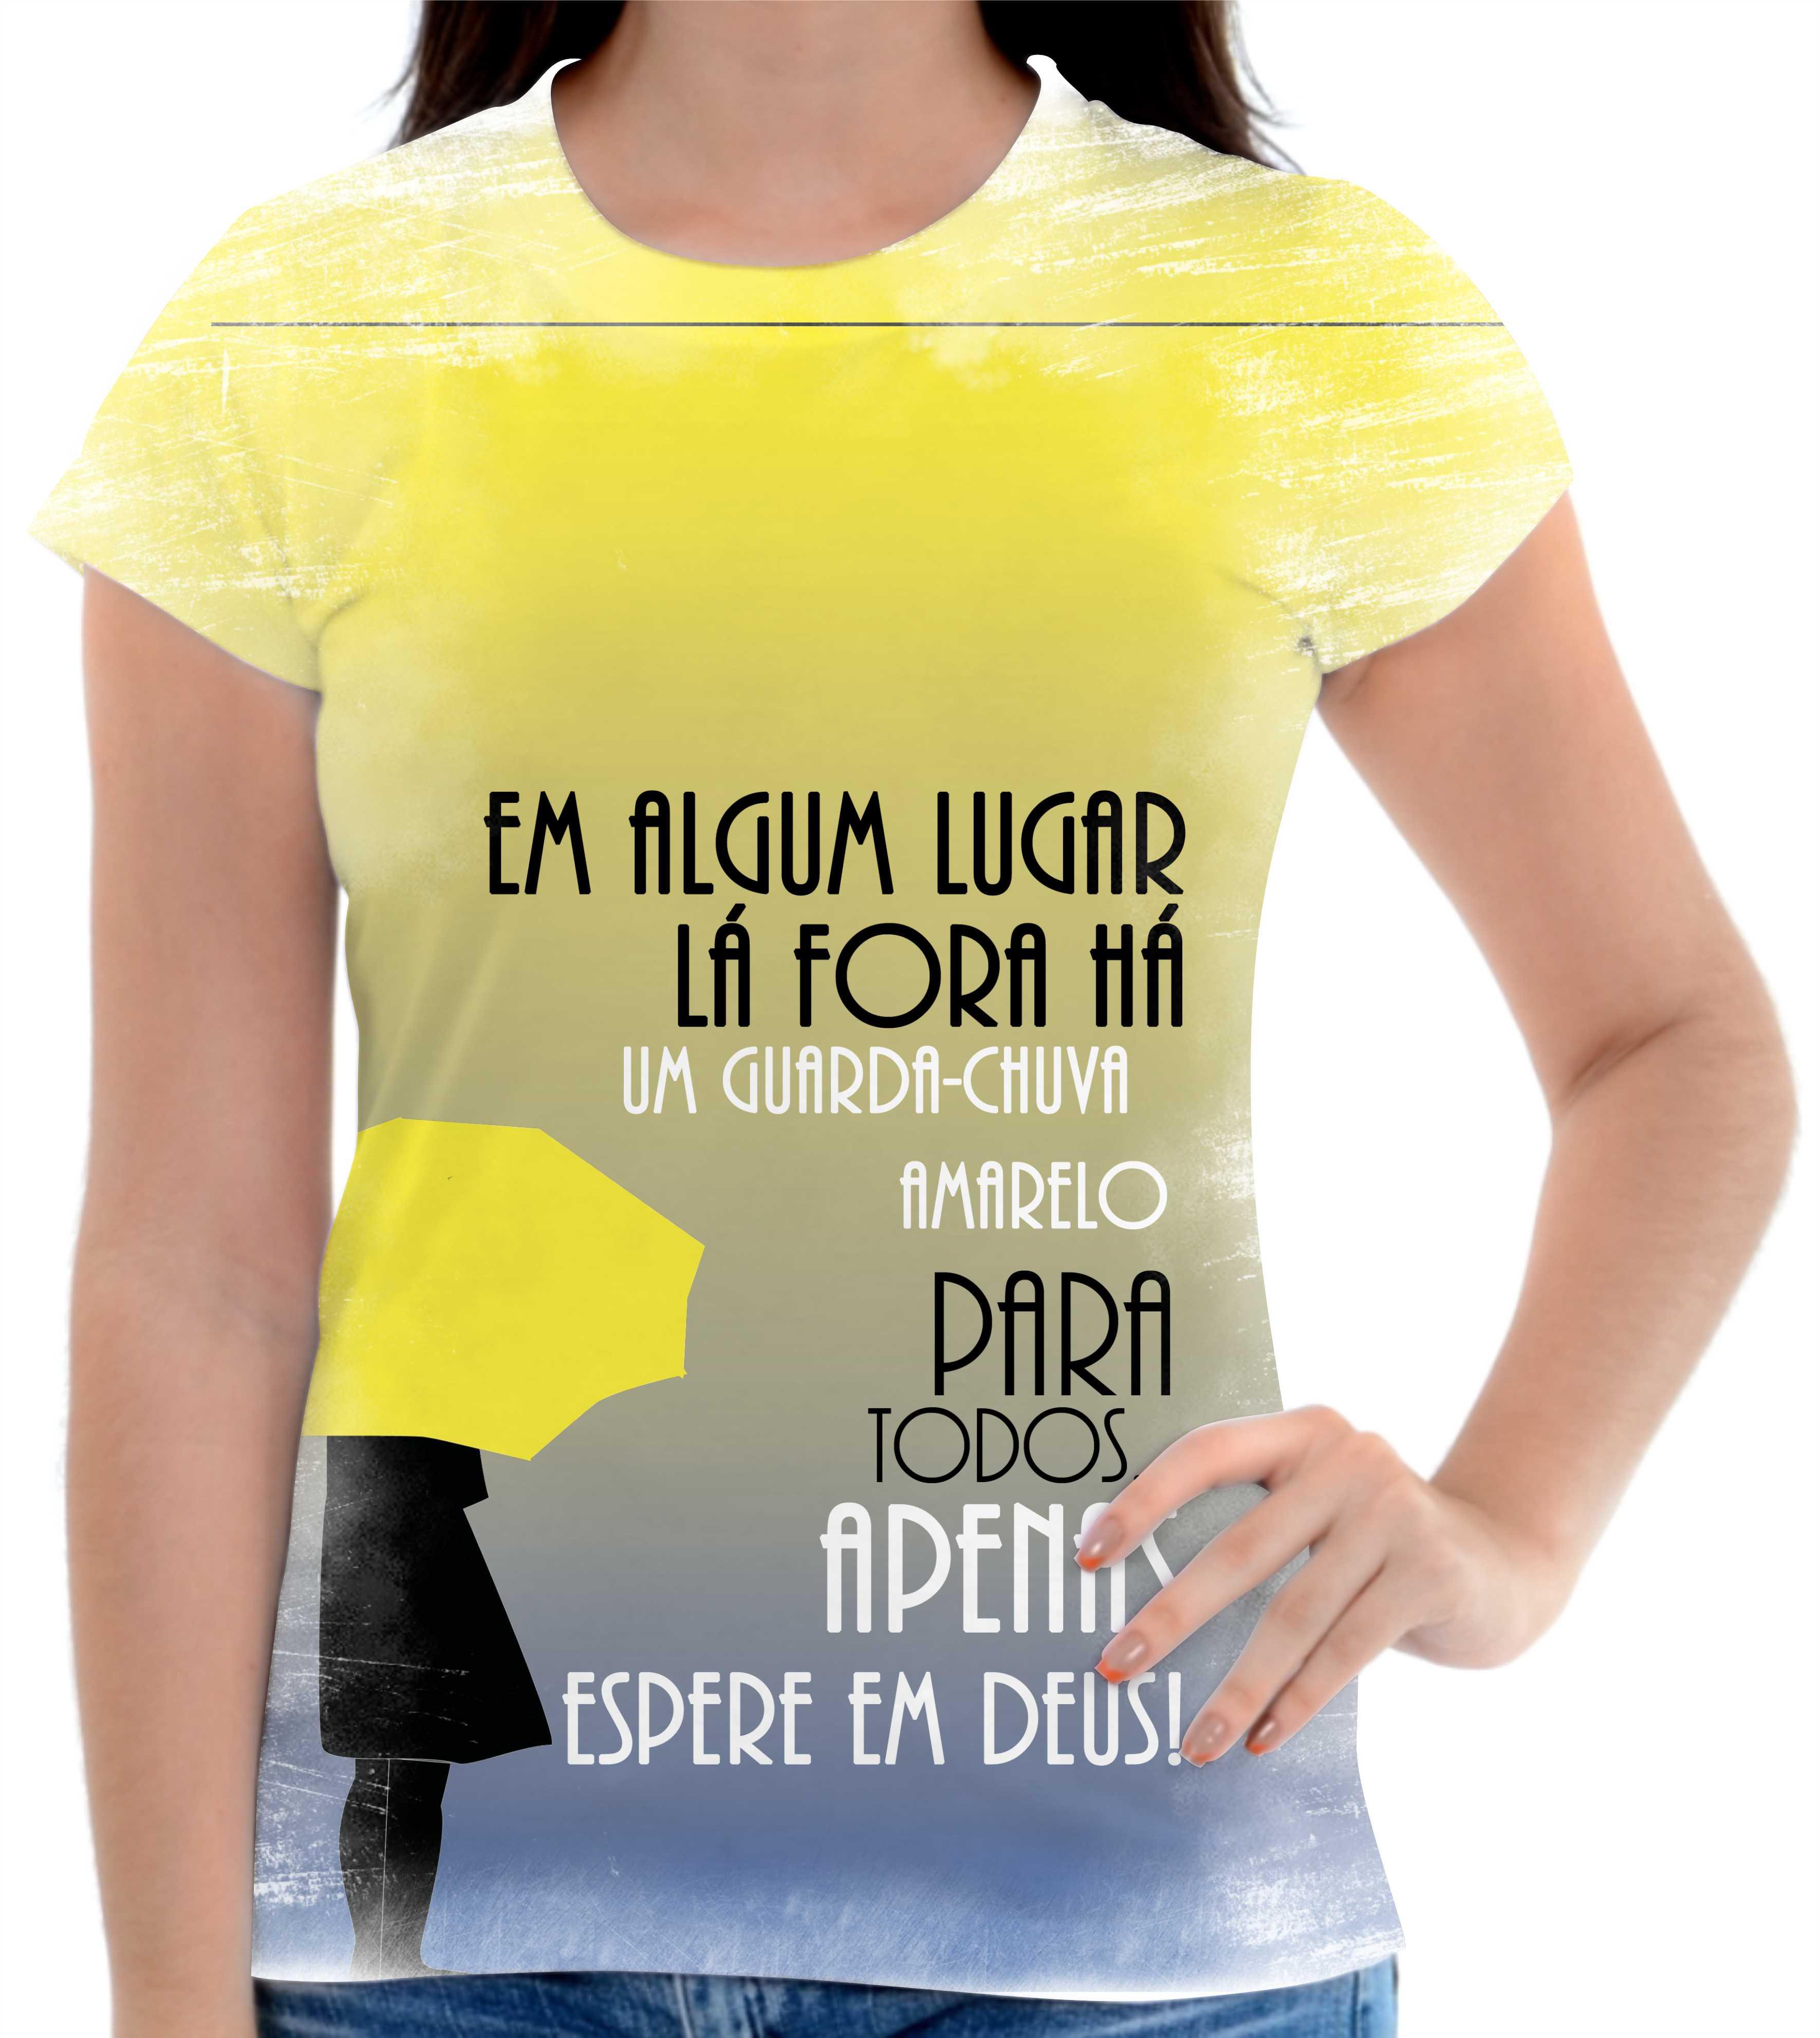 c0ea31ca72 Camisa Pedi a Deus Um Filho